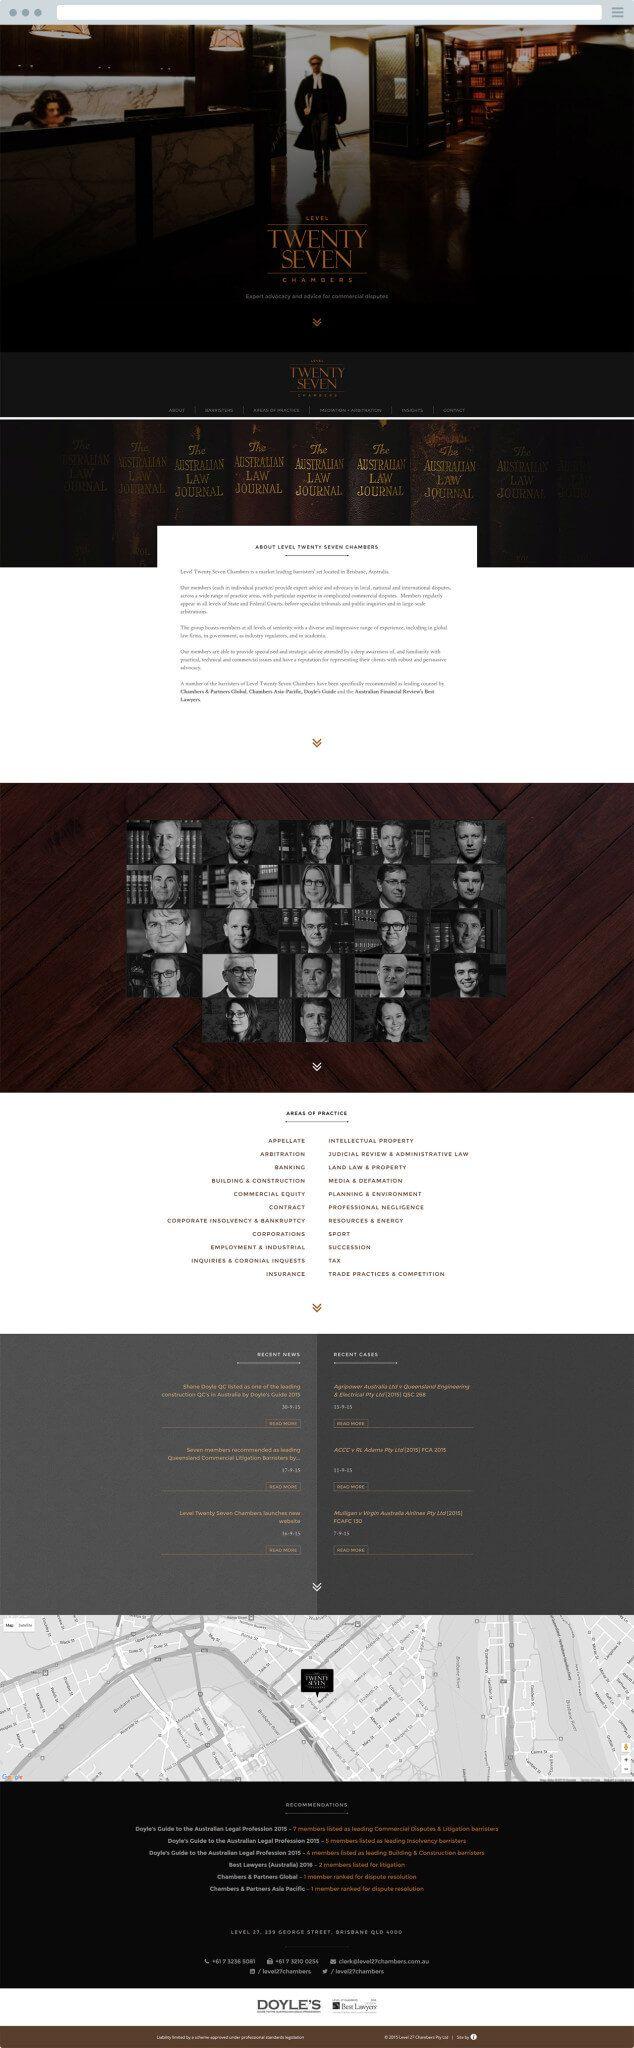 Level 27 Chambers - Website Design | iCreate Advertising